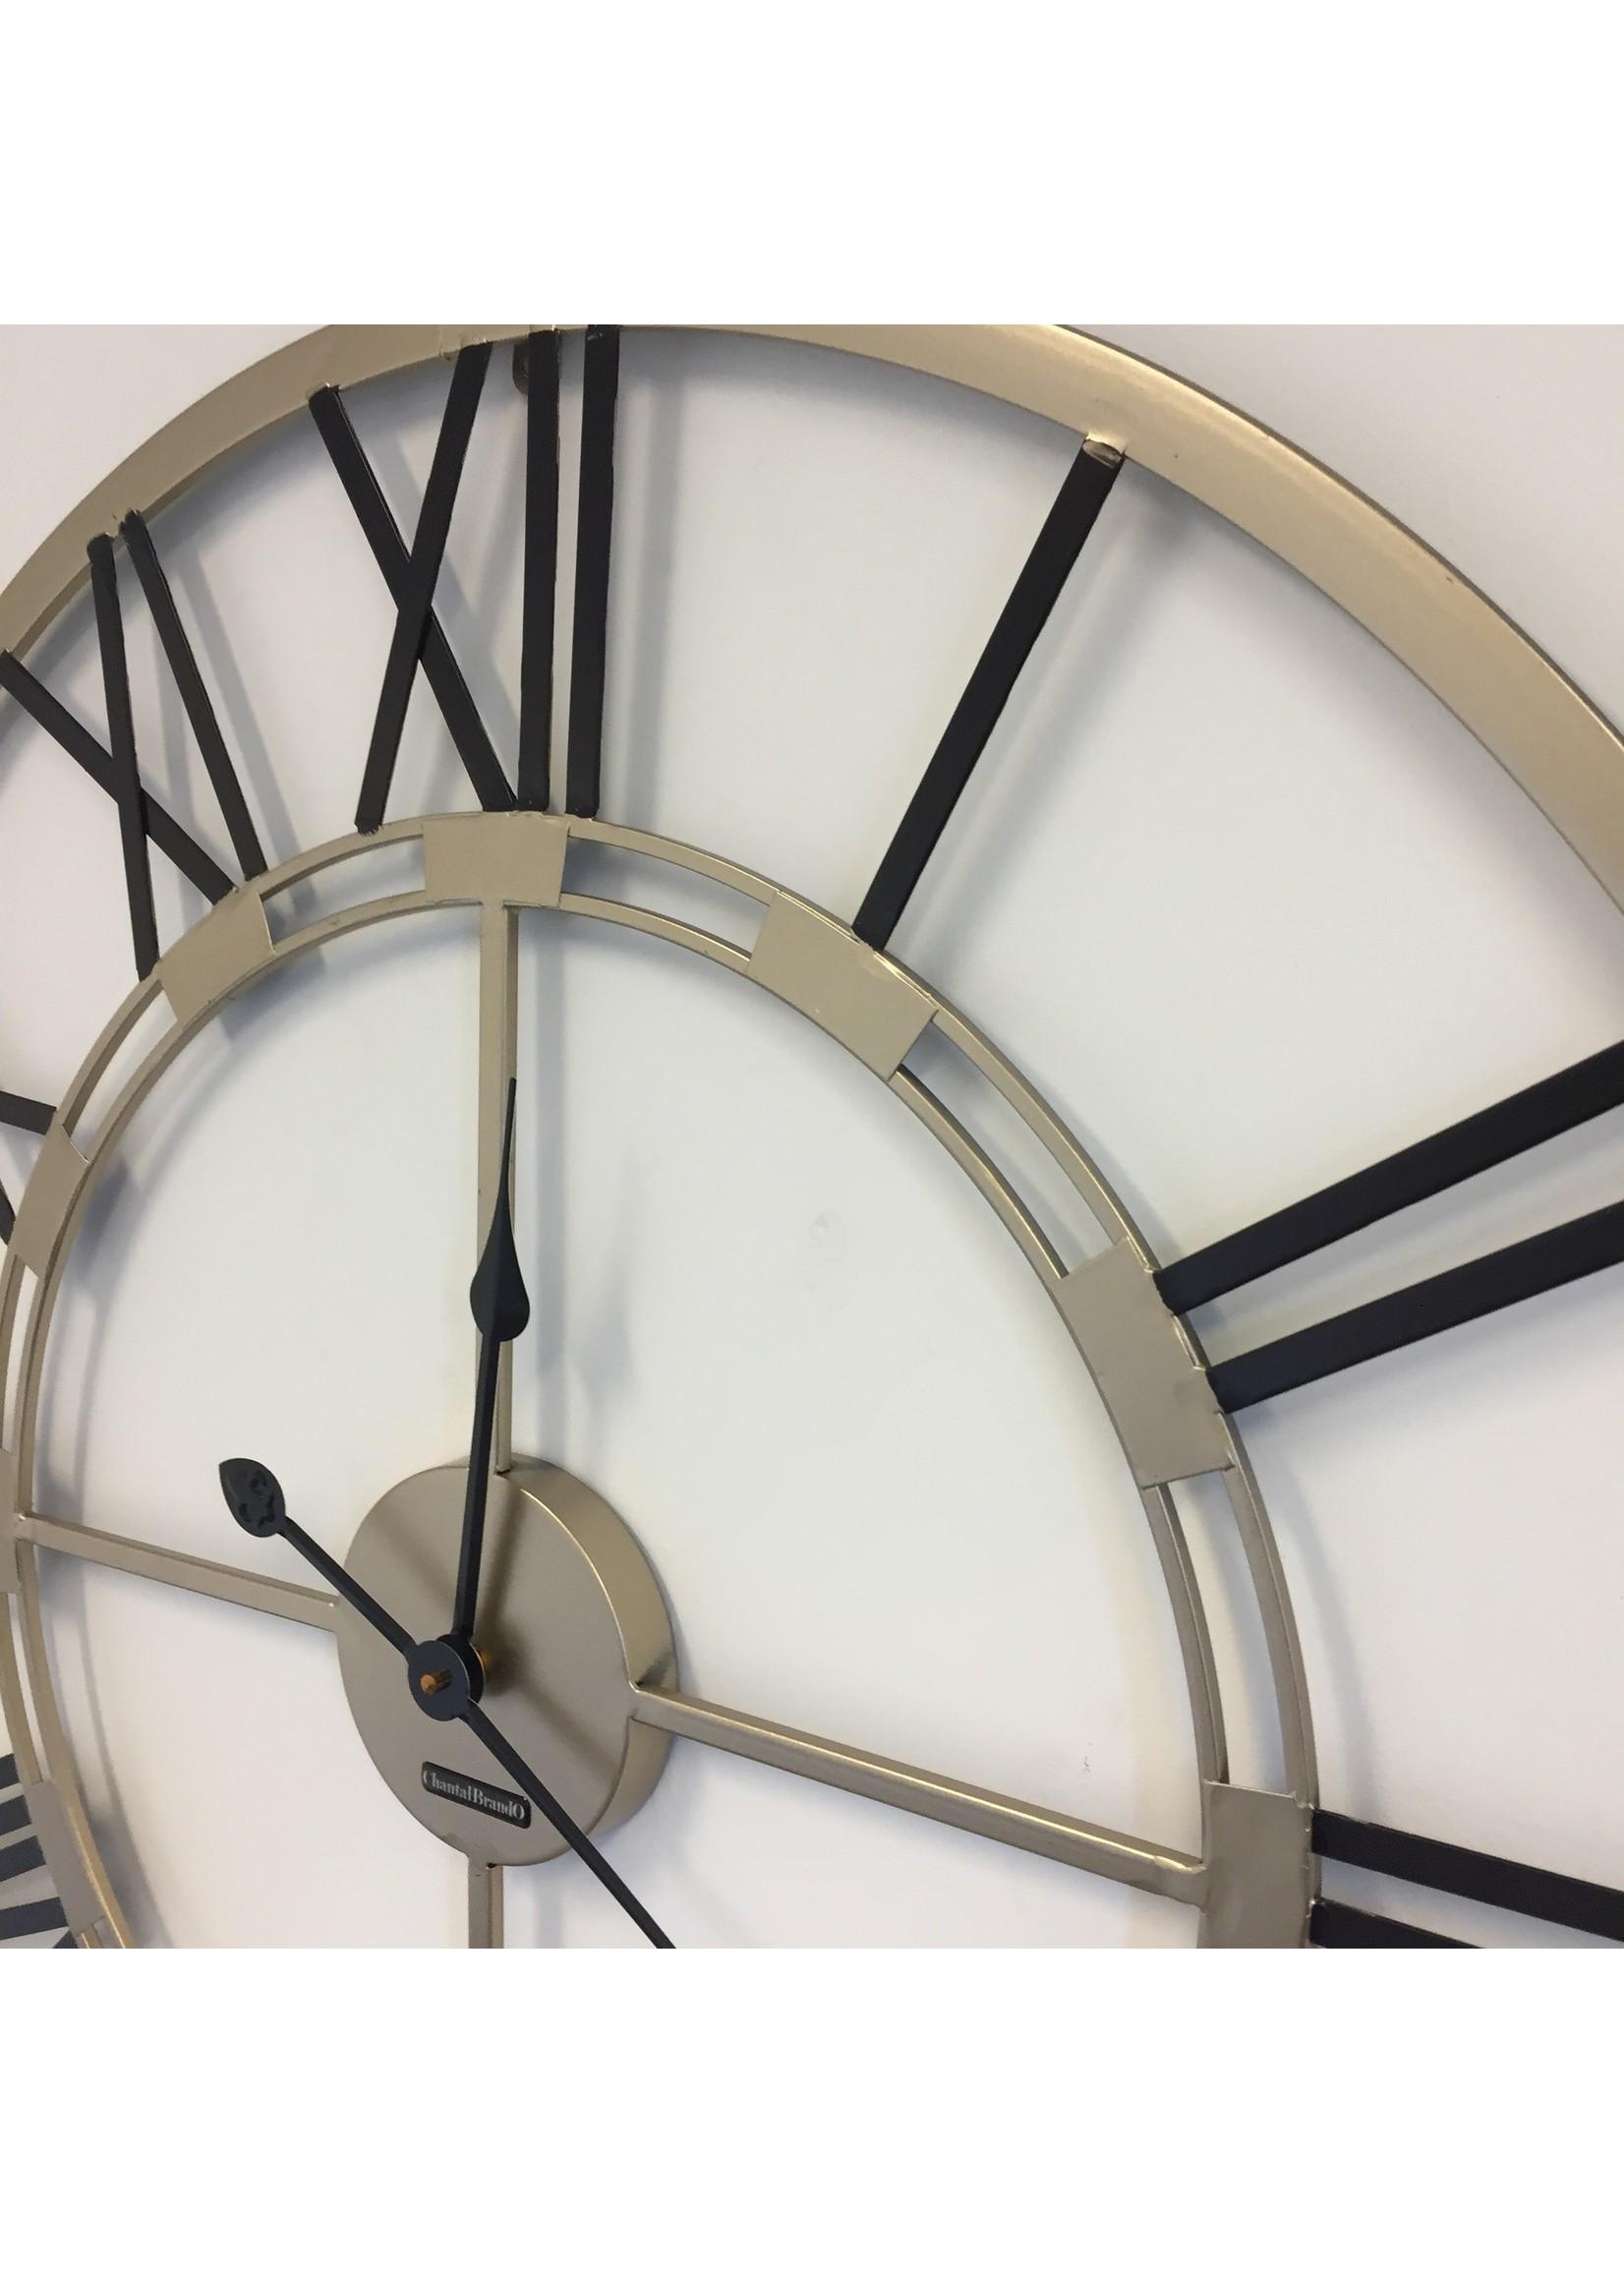 Klokkendiscounter Wandklok Black & Gold Industrieel modern design